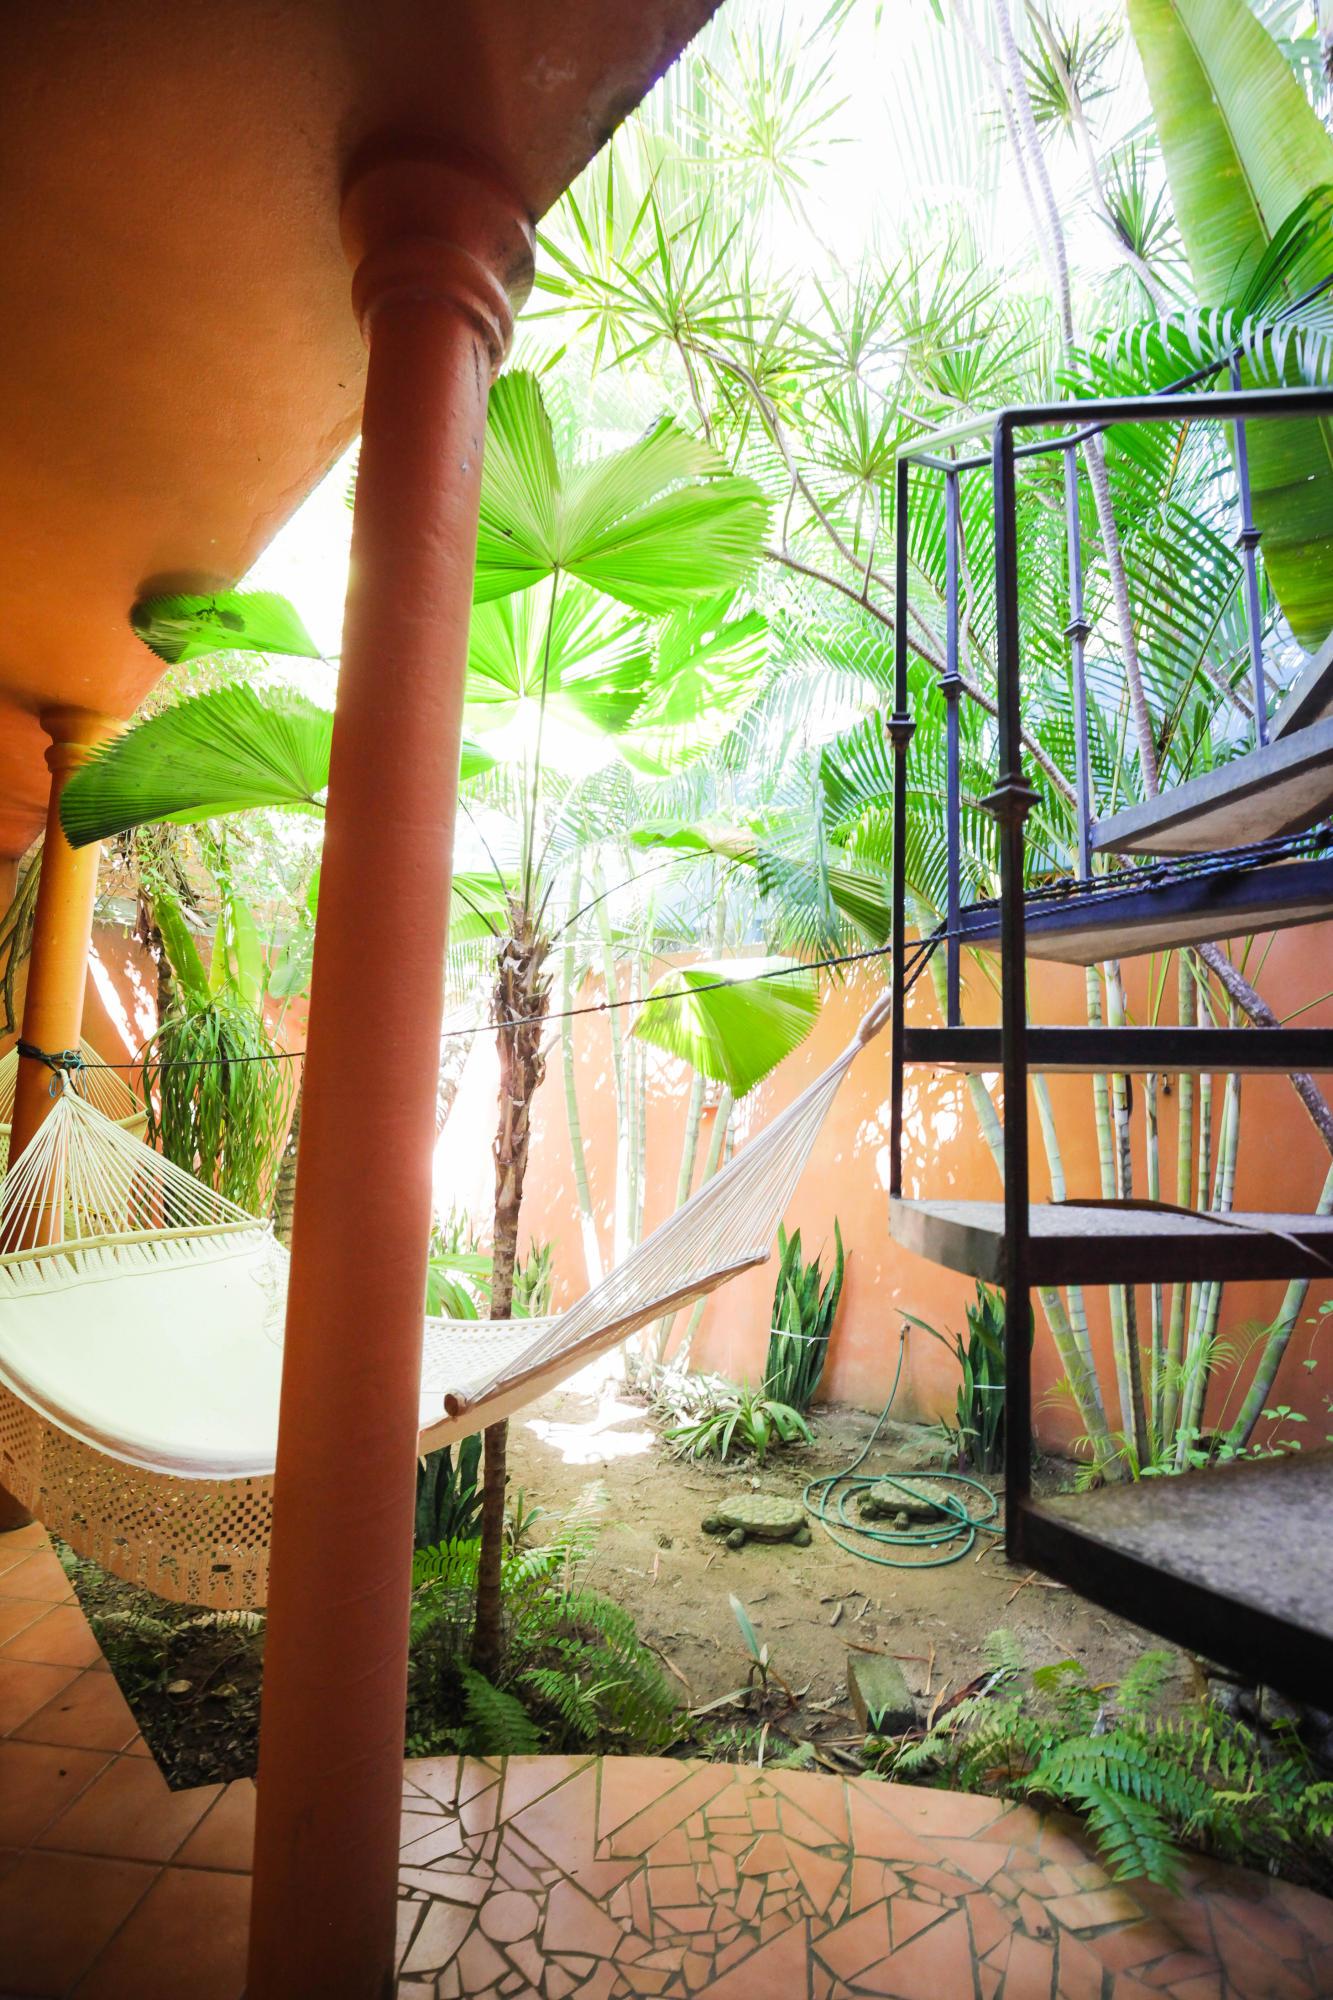 San Pancho, 2 Bedrooms Bedrooms, ,2 BathroomsBathrooms,House,For Sale,Av. Tercer Mundo,17717